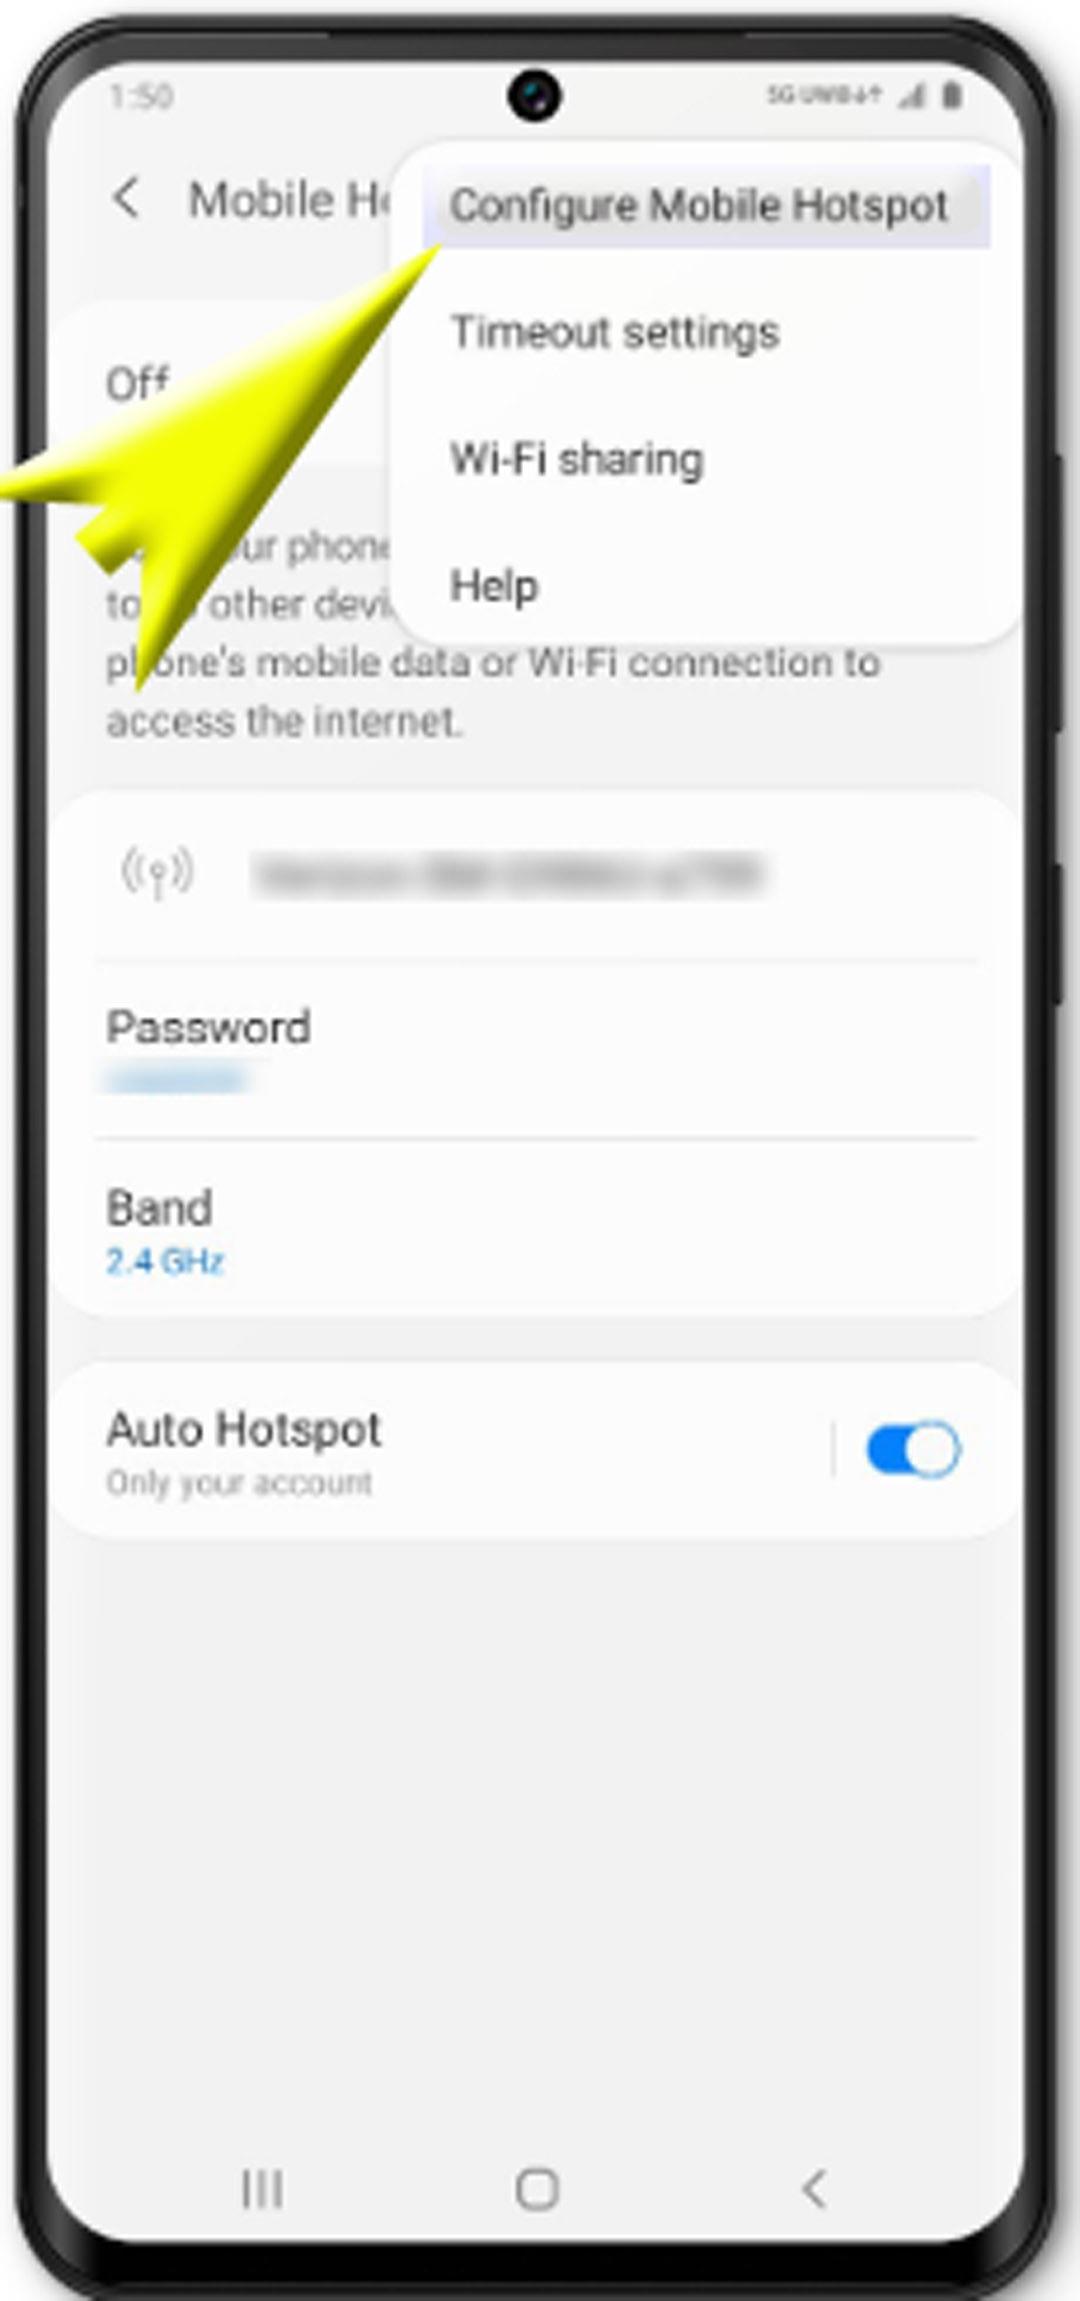 set up galaxy s20 mobile hotspot - configure mobile hotspot